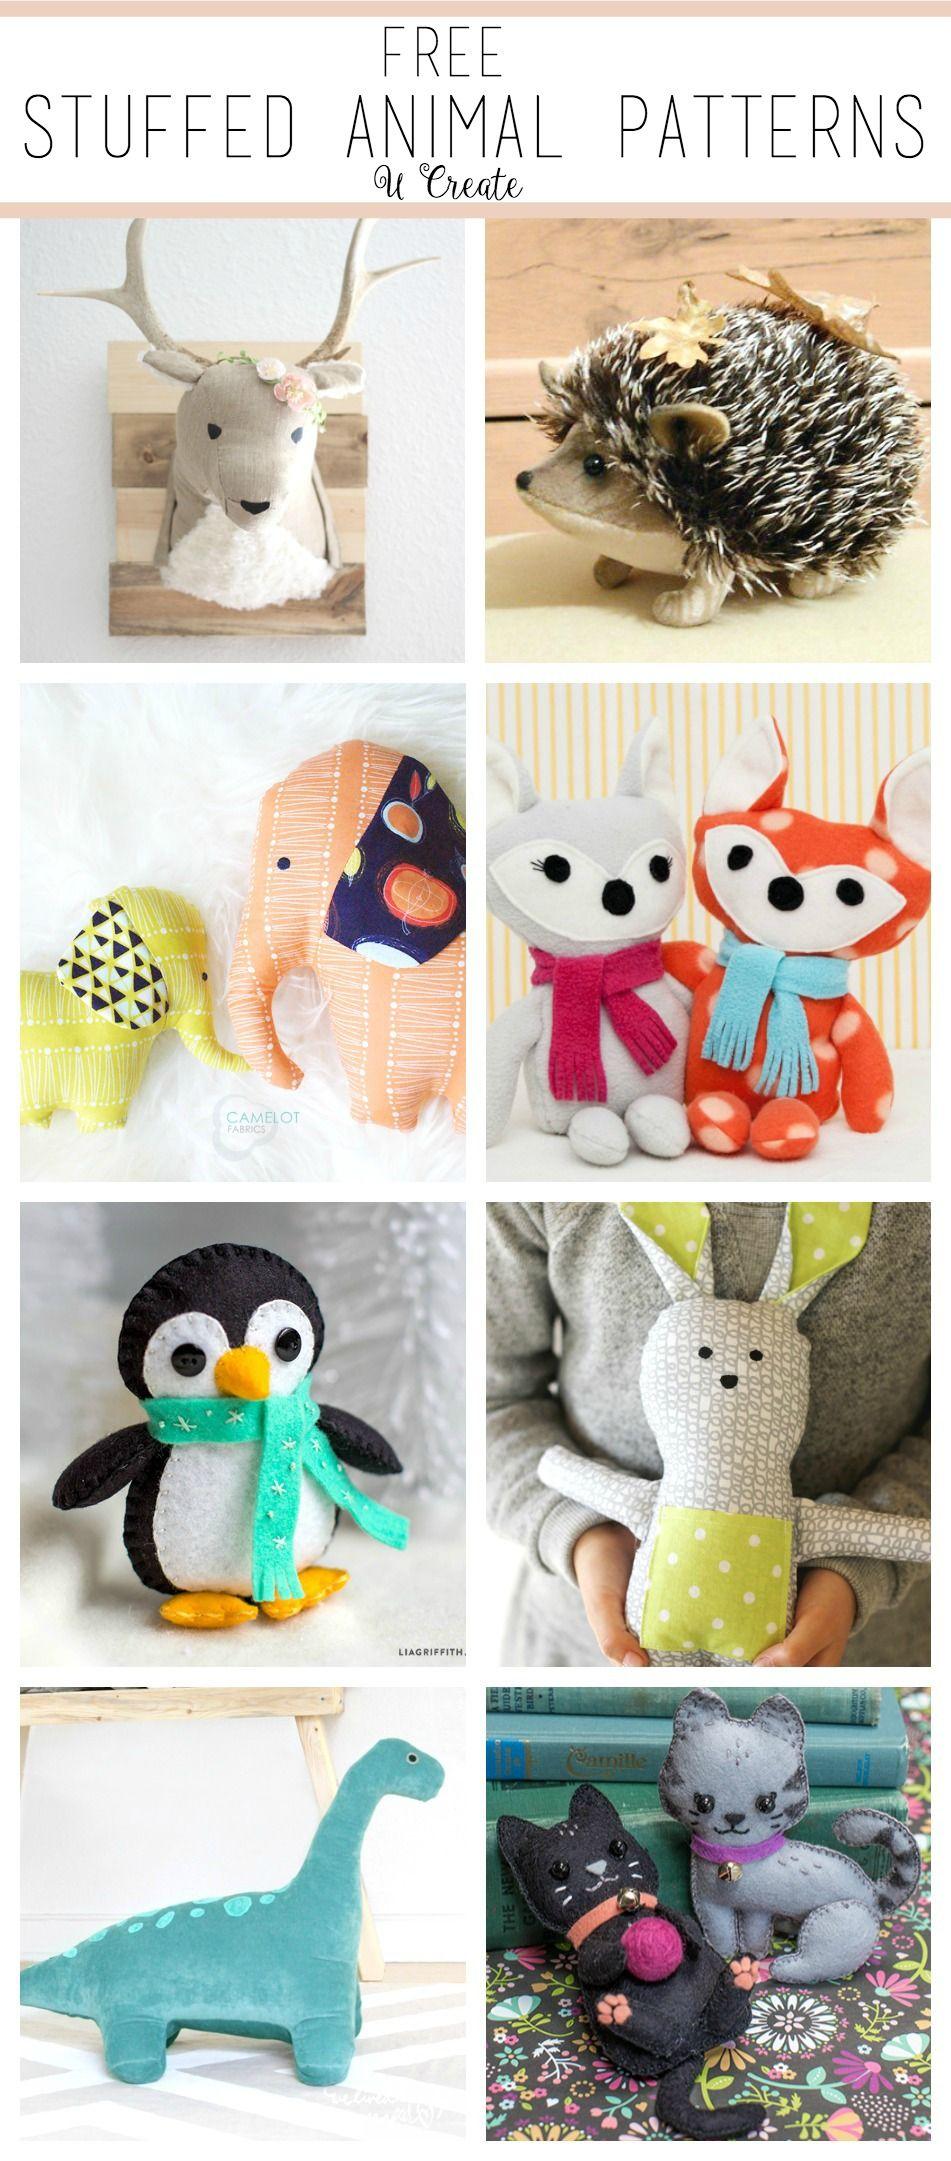 Free Stuffed Animal Patterns - The Cutest | Amigurumi | Pinterest - Free Printable Stuffed Animal Patterns